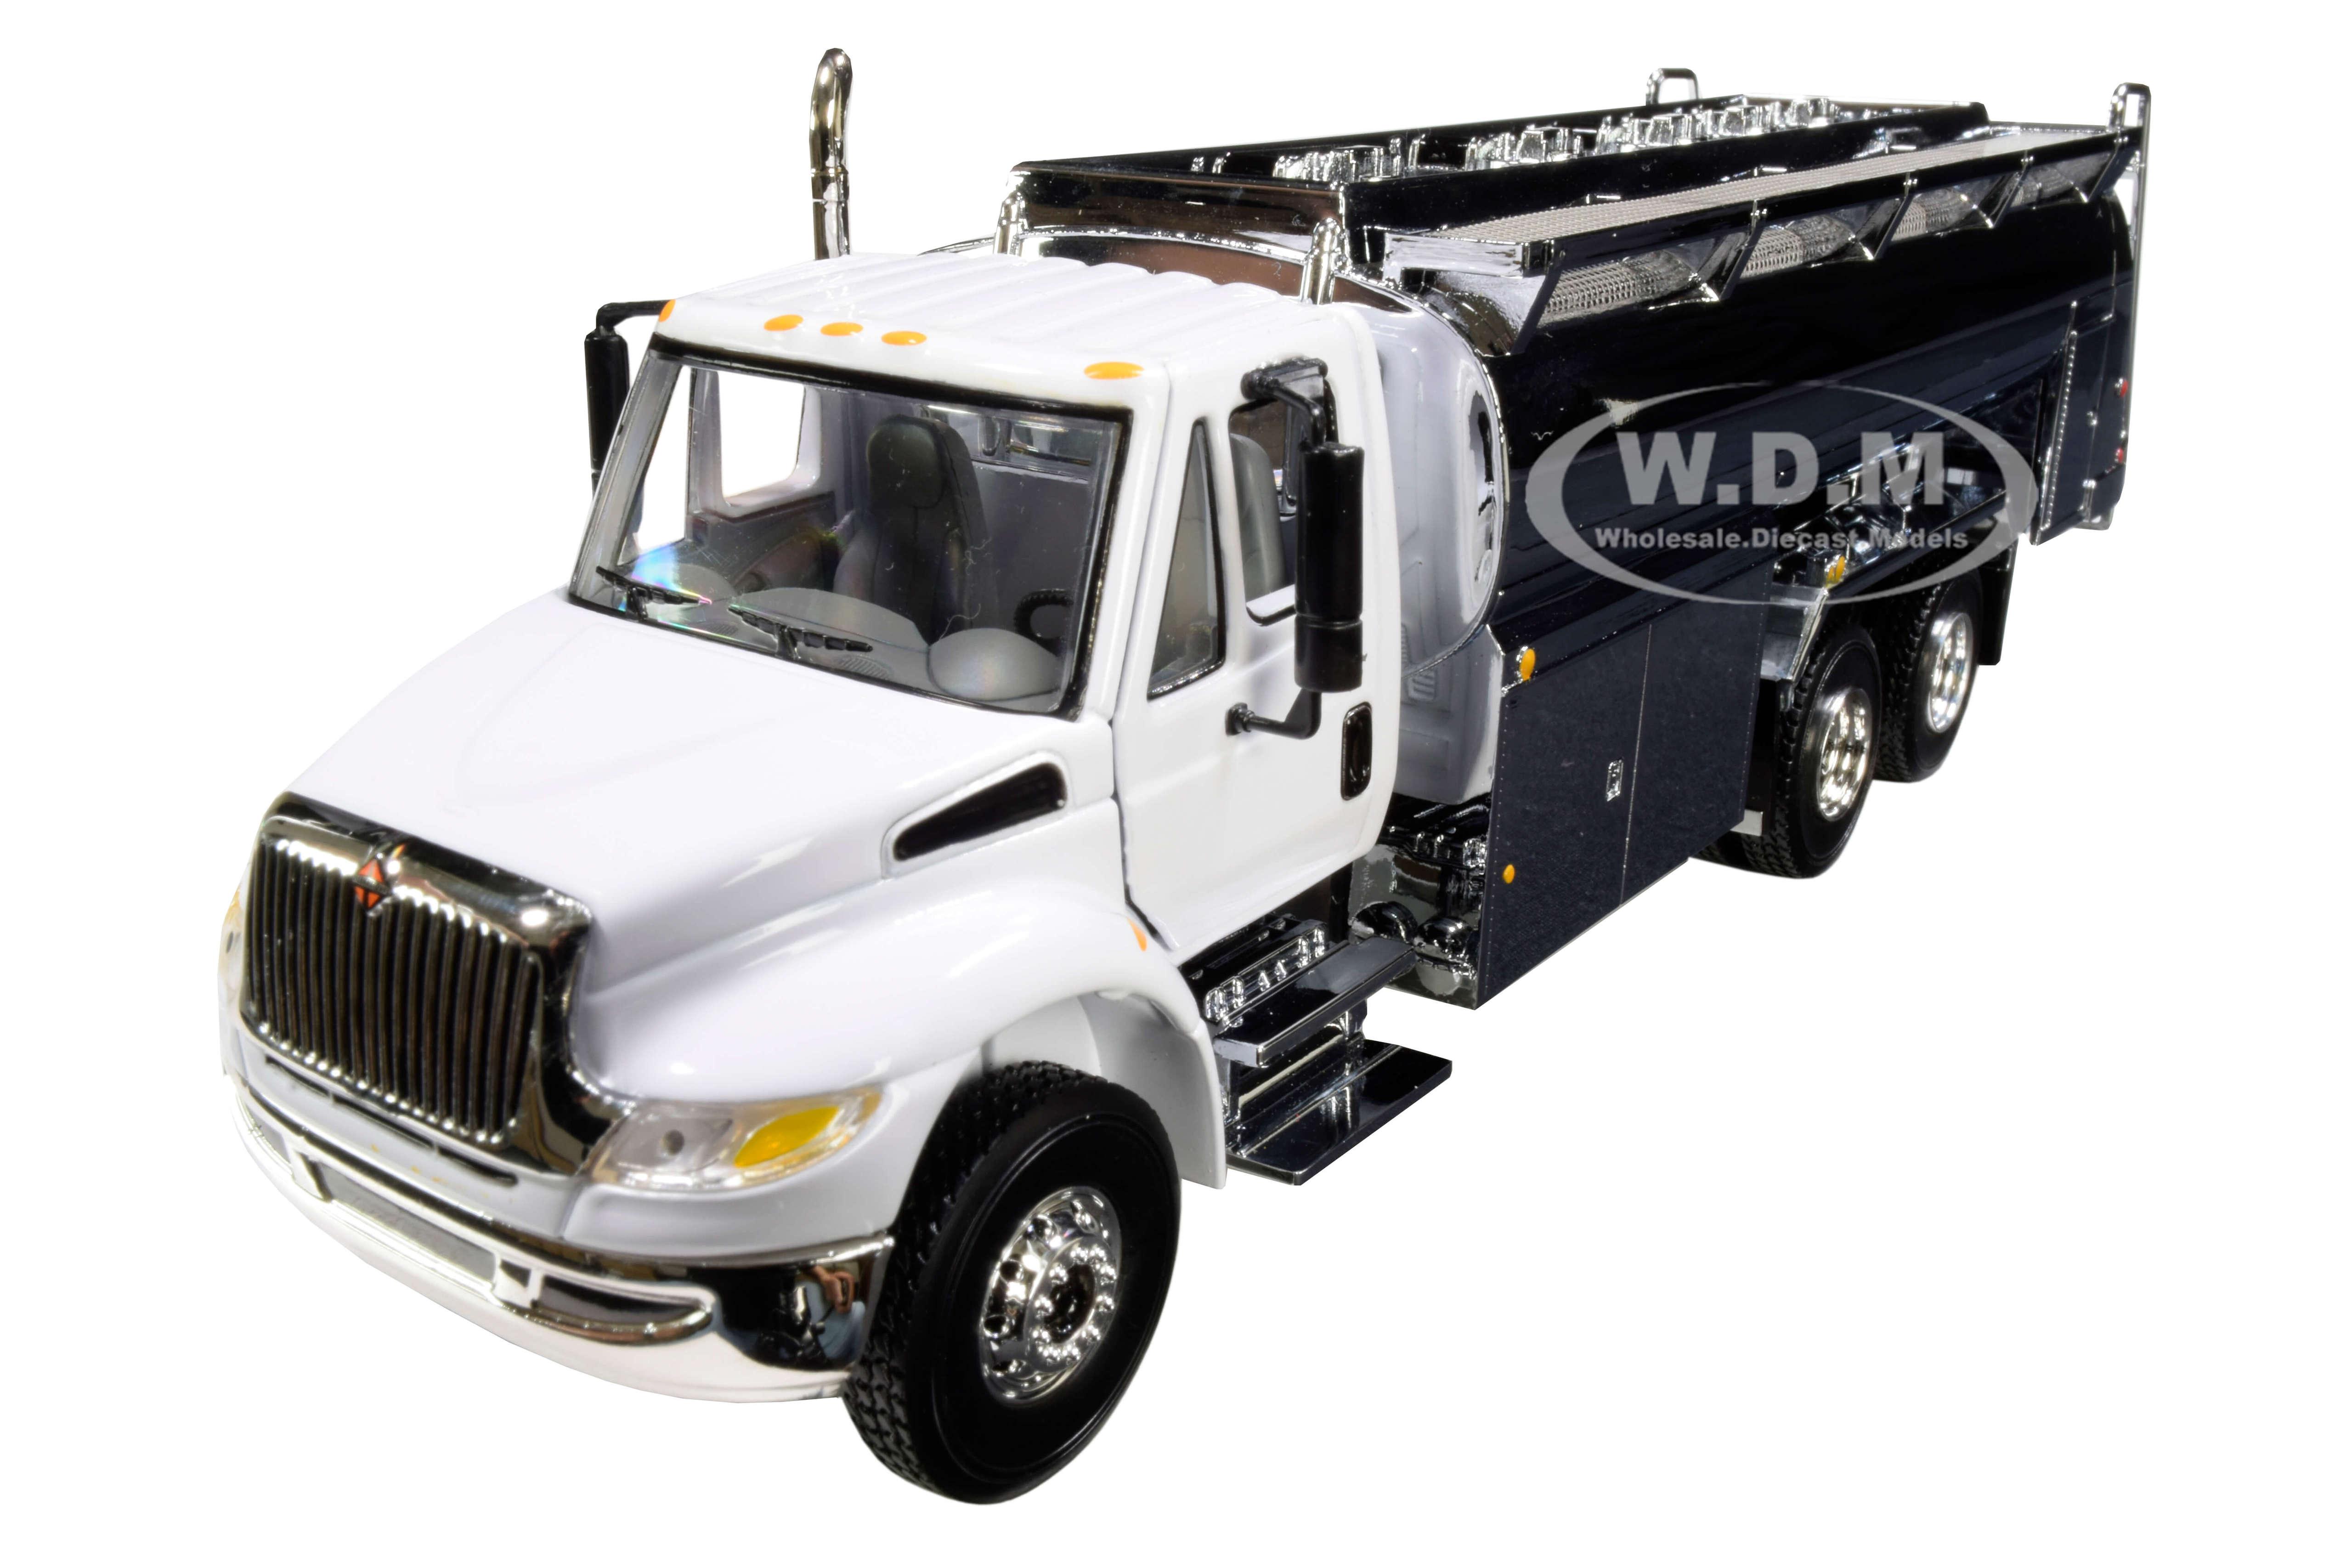 International DuraStar Liquid Fuel Tank Truck White and Chrome 1/50 Diecast Model by First Gear